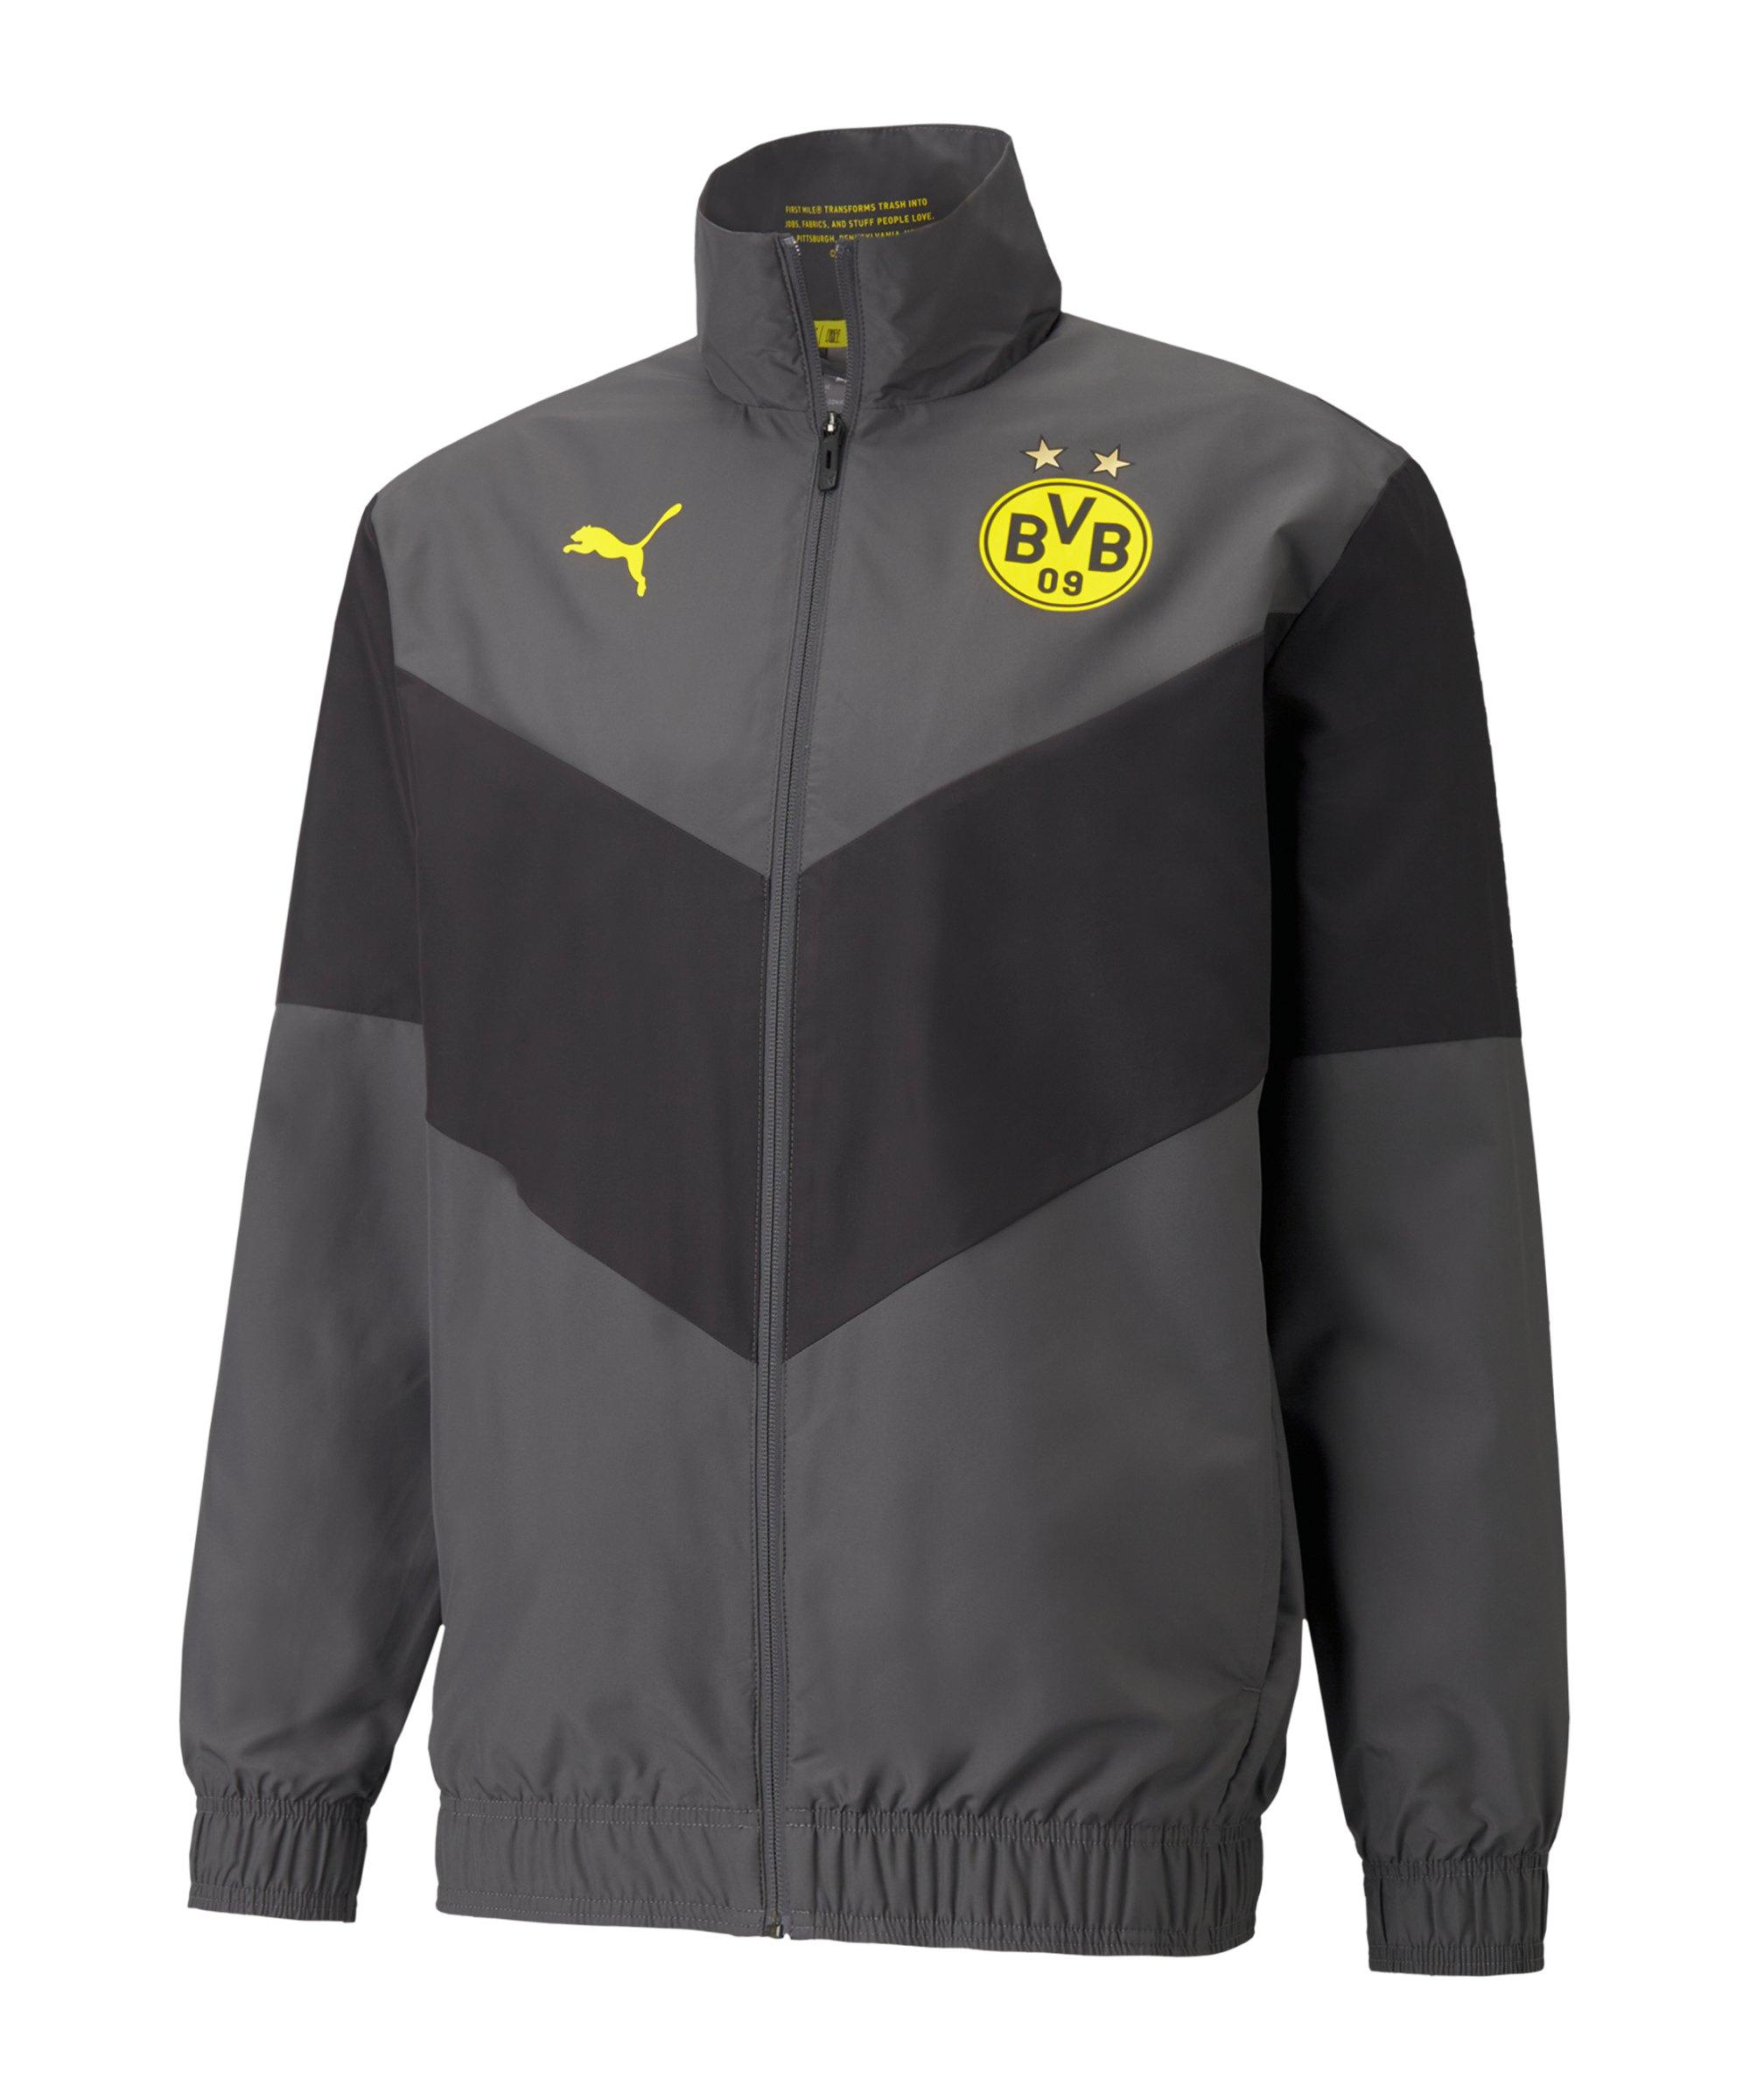 PUMA BVB Dortmund Prematch Jacke 2021/2022 F04 - grau